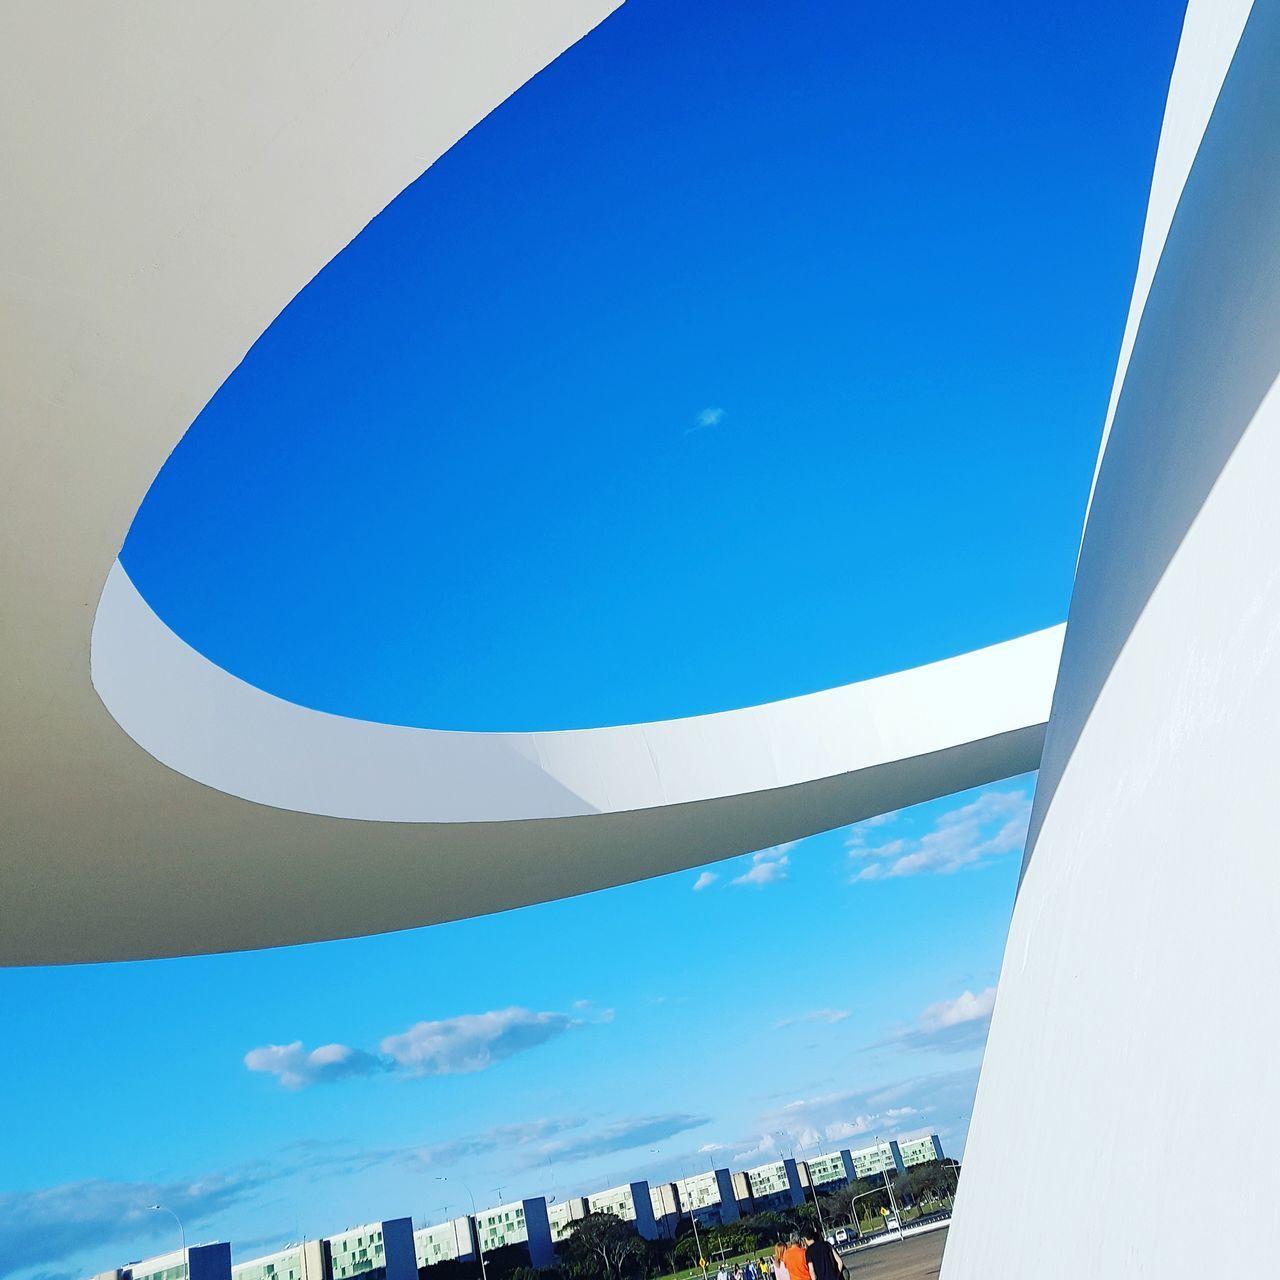 Blue Sky Day Outdoors Built Structure Blue Architecture City Modern Brasília - Brazil